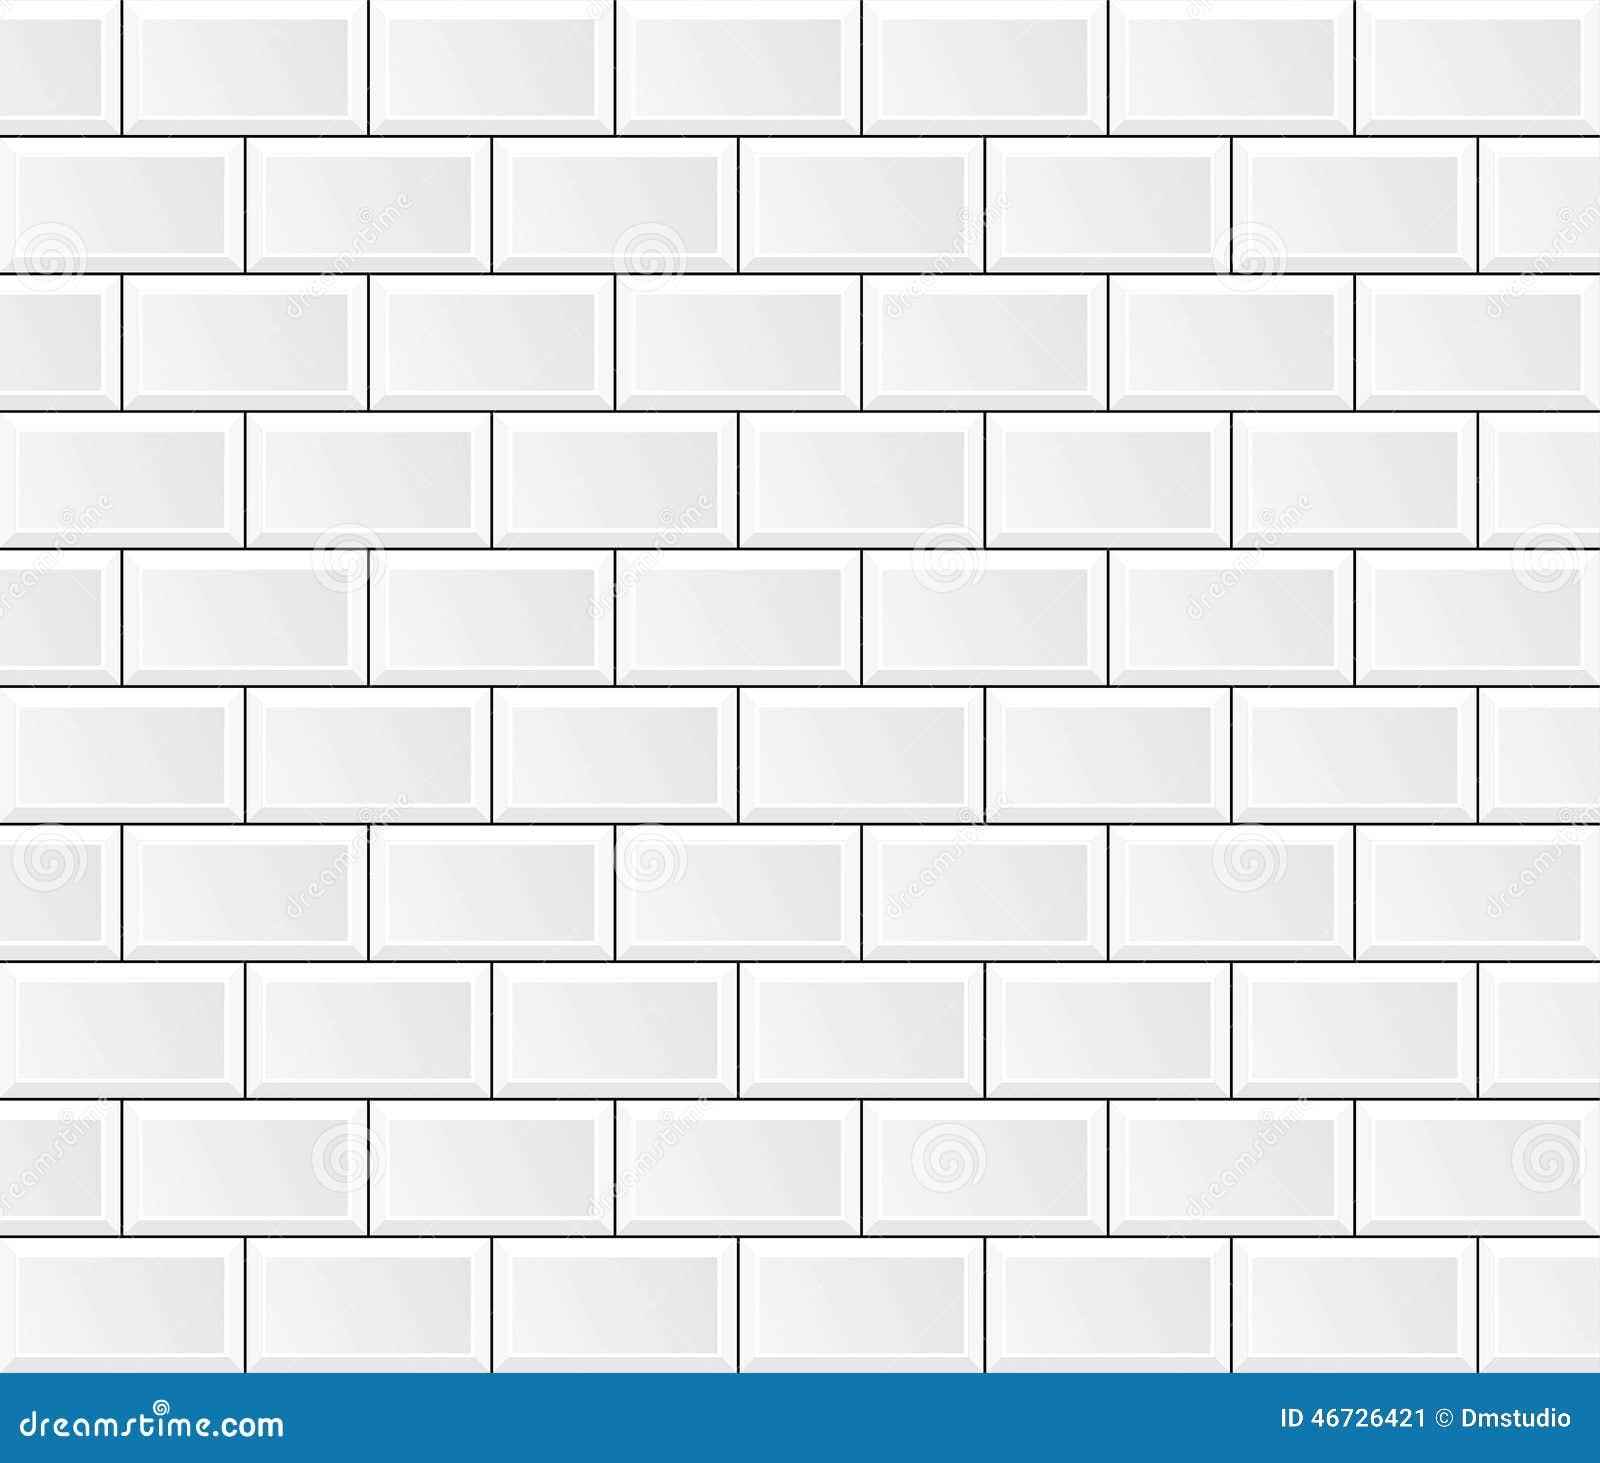 Vector white tile wall stock vector. Illustration of bathroom - 46726421